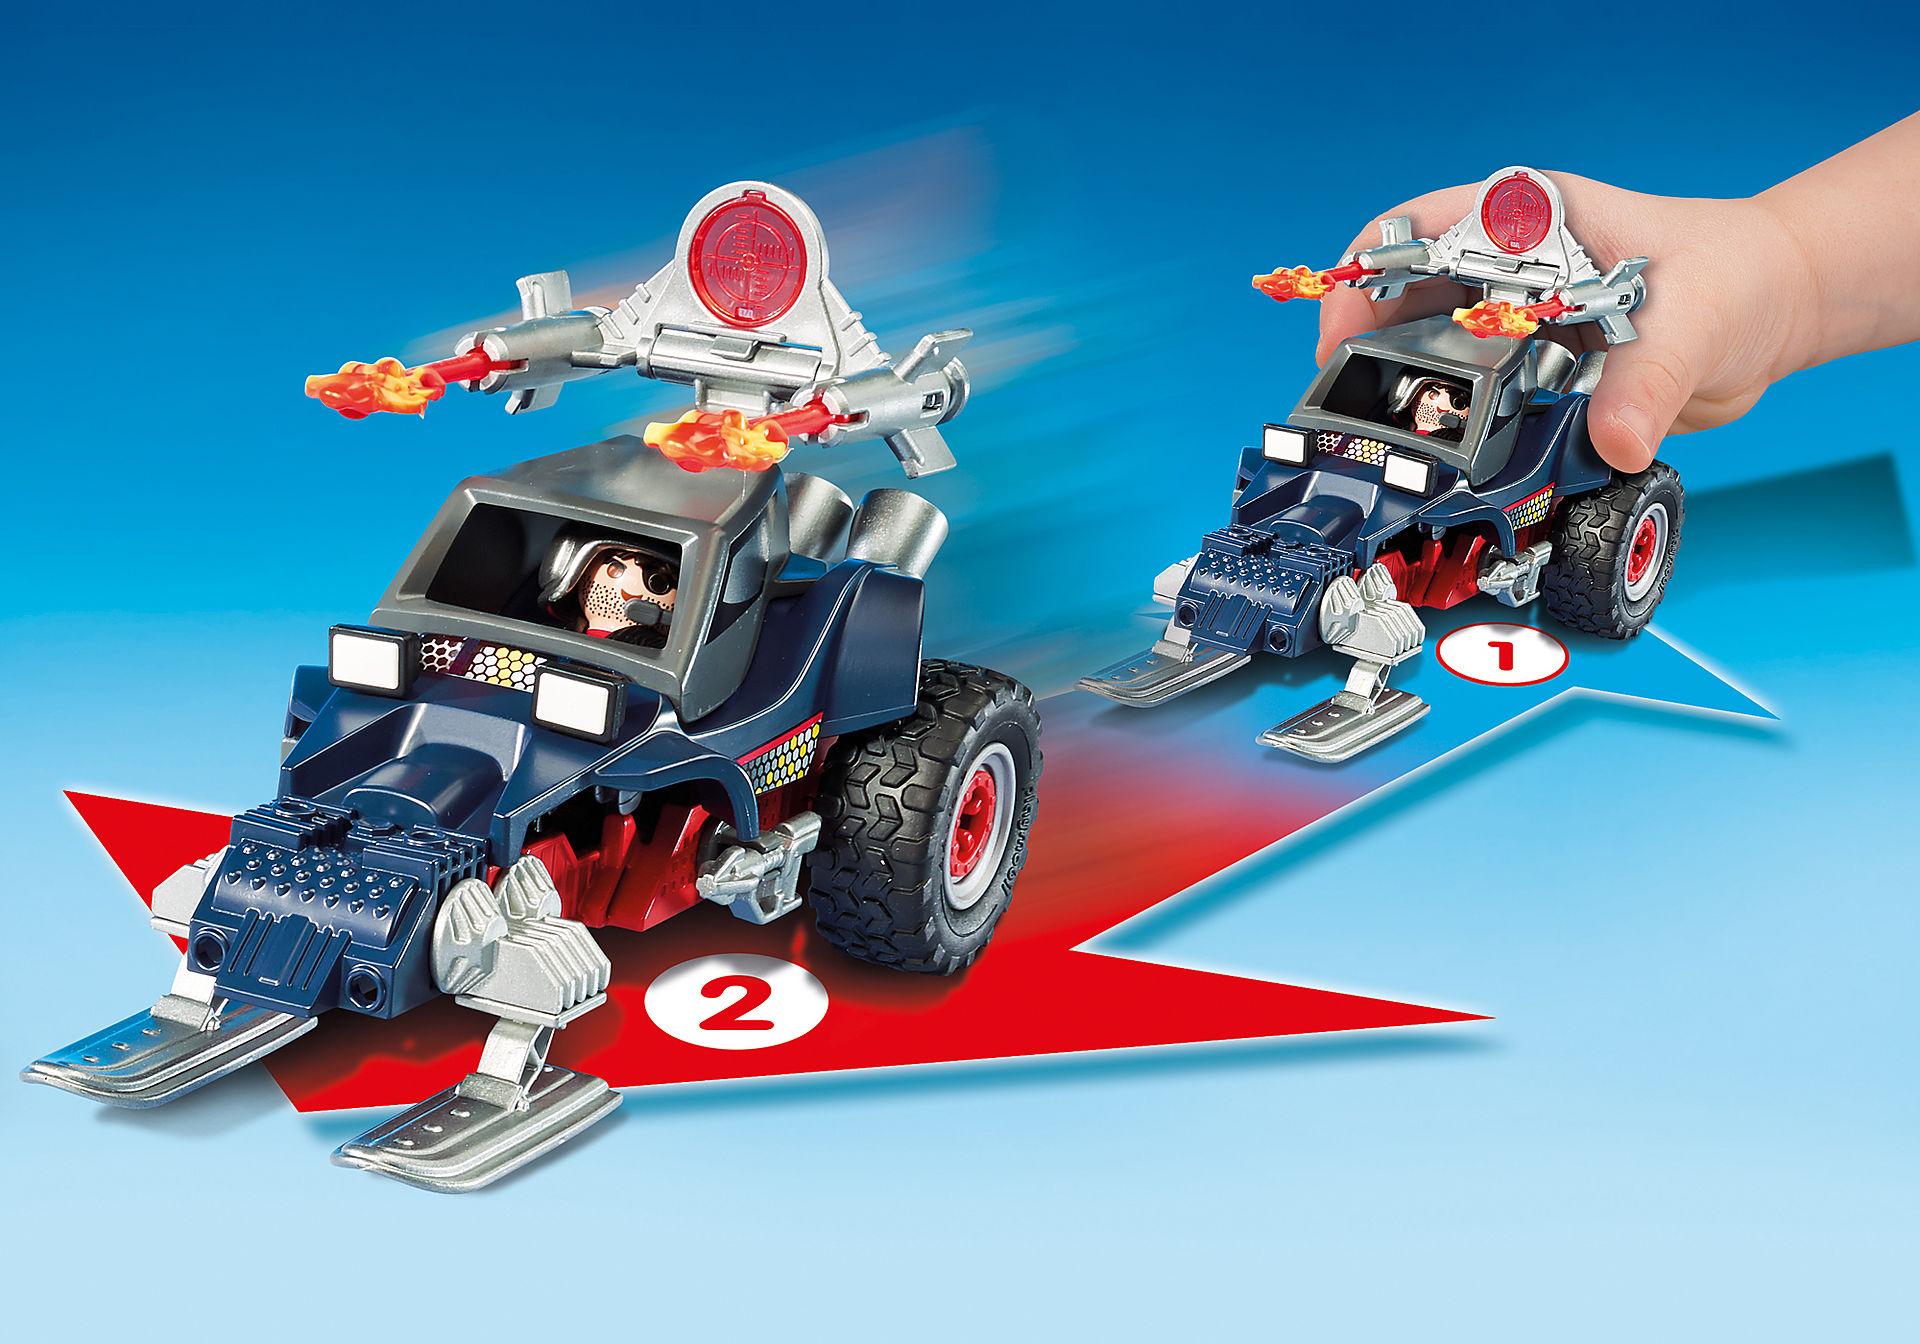 http://media.playmobil.com/i/playmobil/9058_product_extra1/Sneeuwscooter met ijspiraat